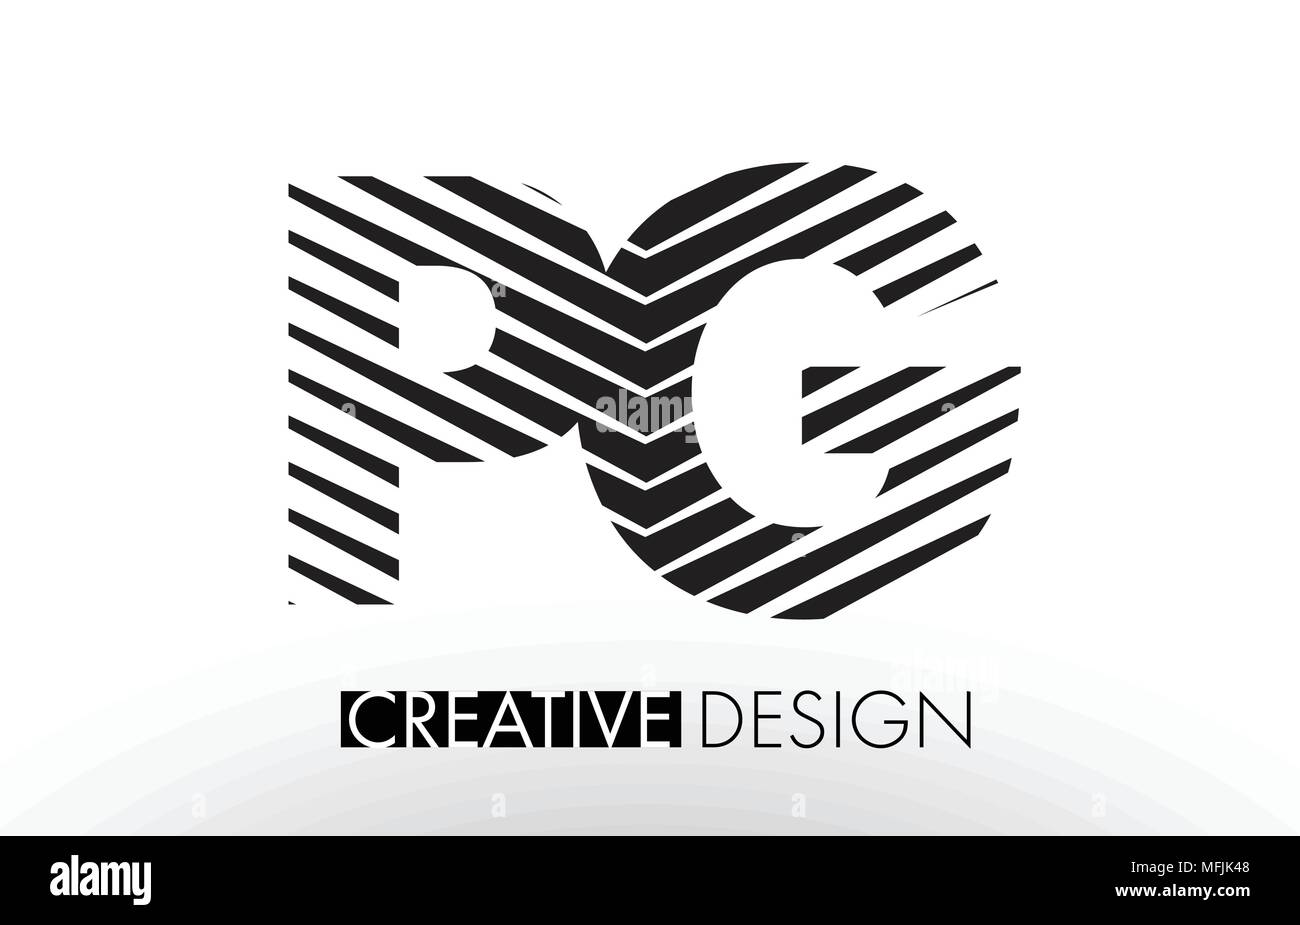 Pg P G Lines Letter Design With Creative Elegant Zebra Vector